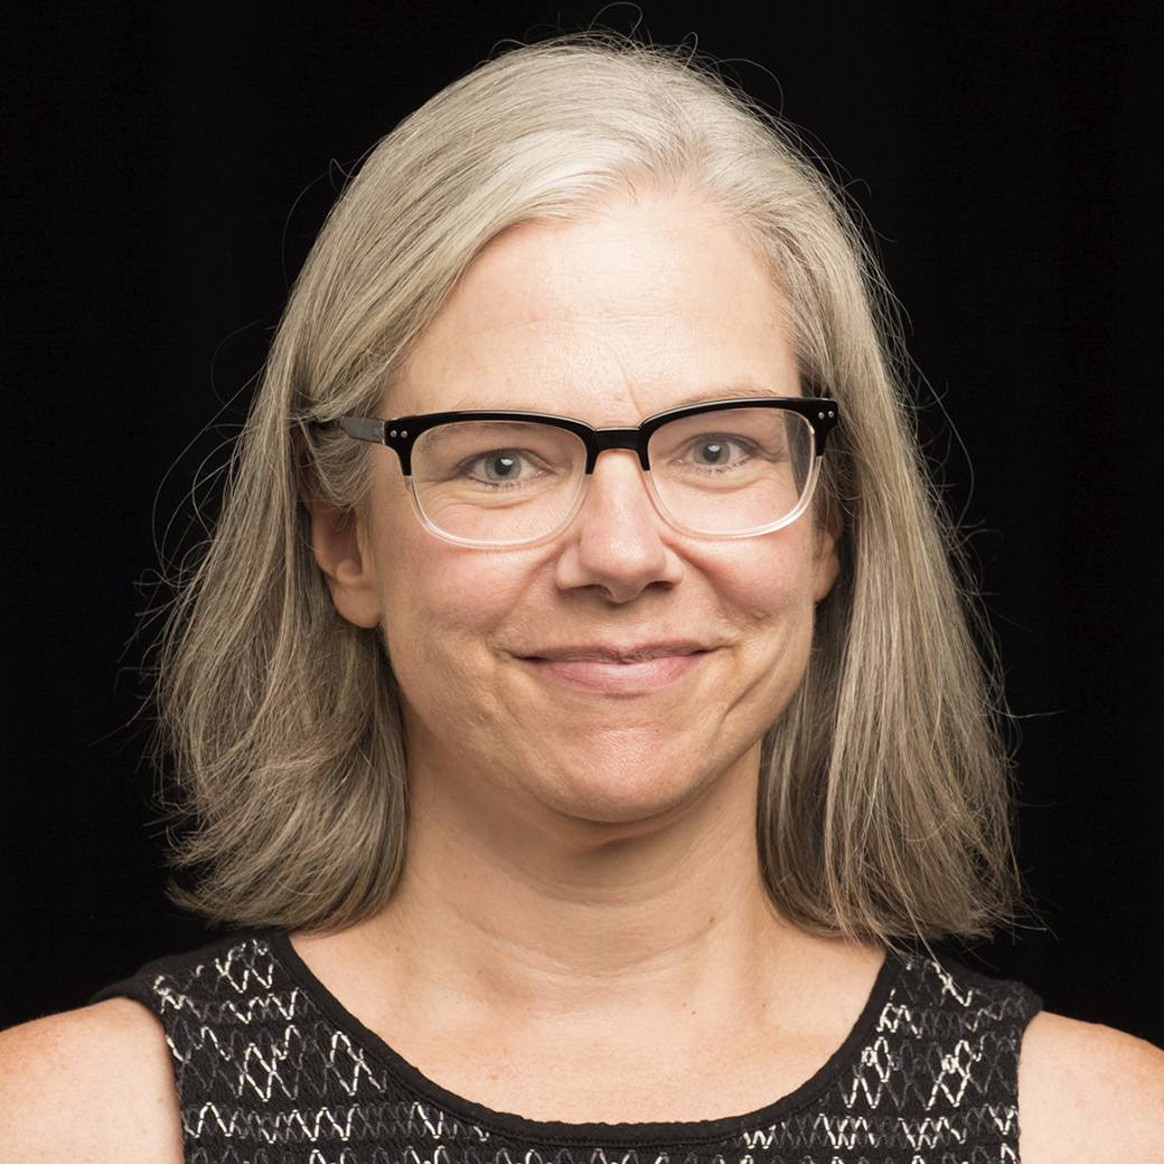 Penn State Associate Professor of Theatre Jeanmarie Higgins